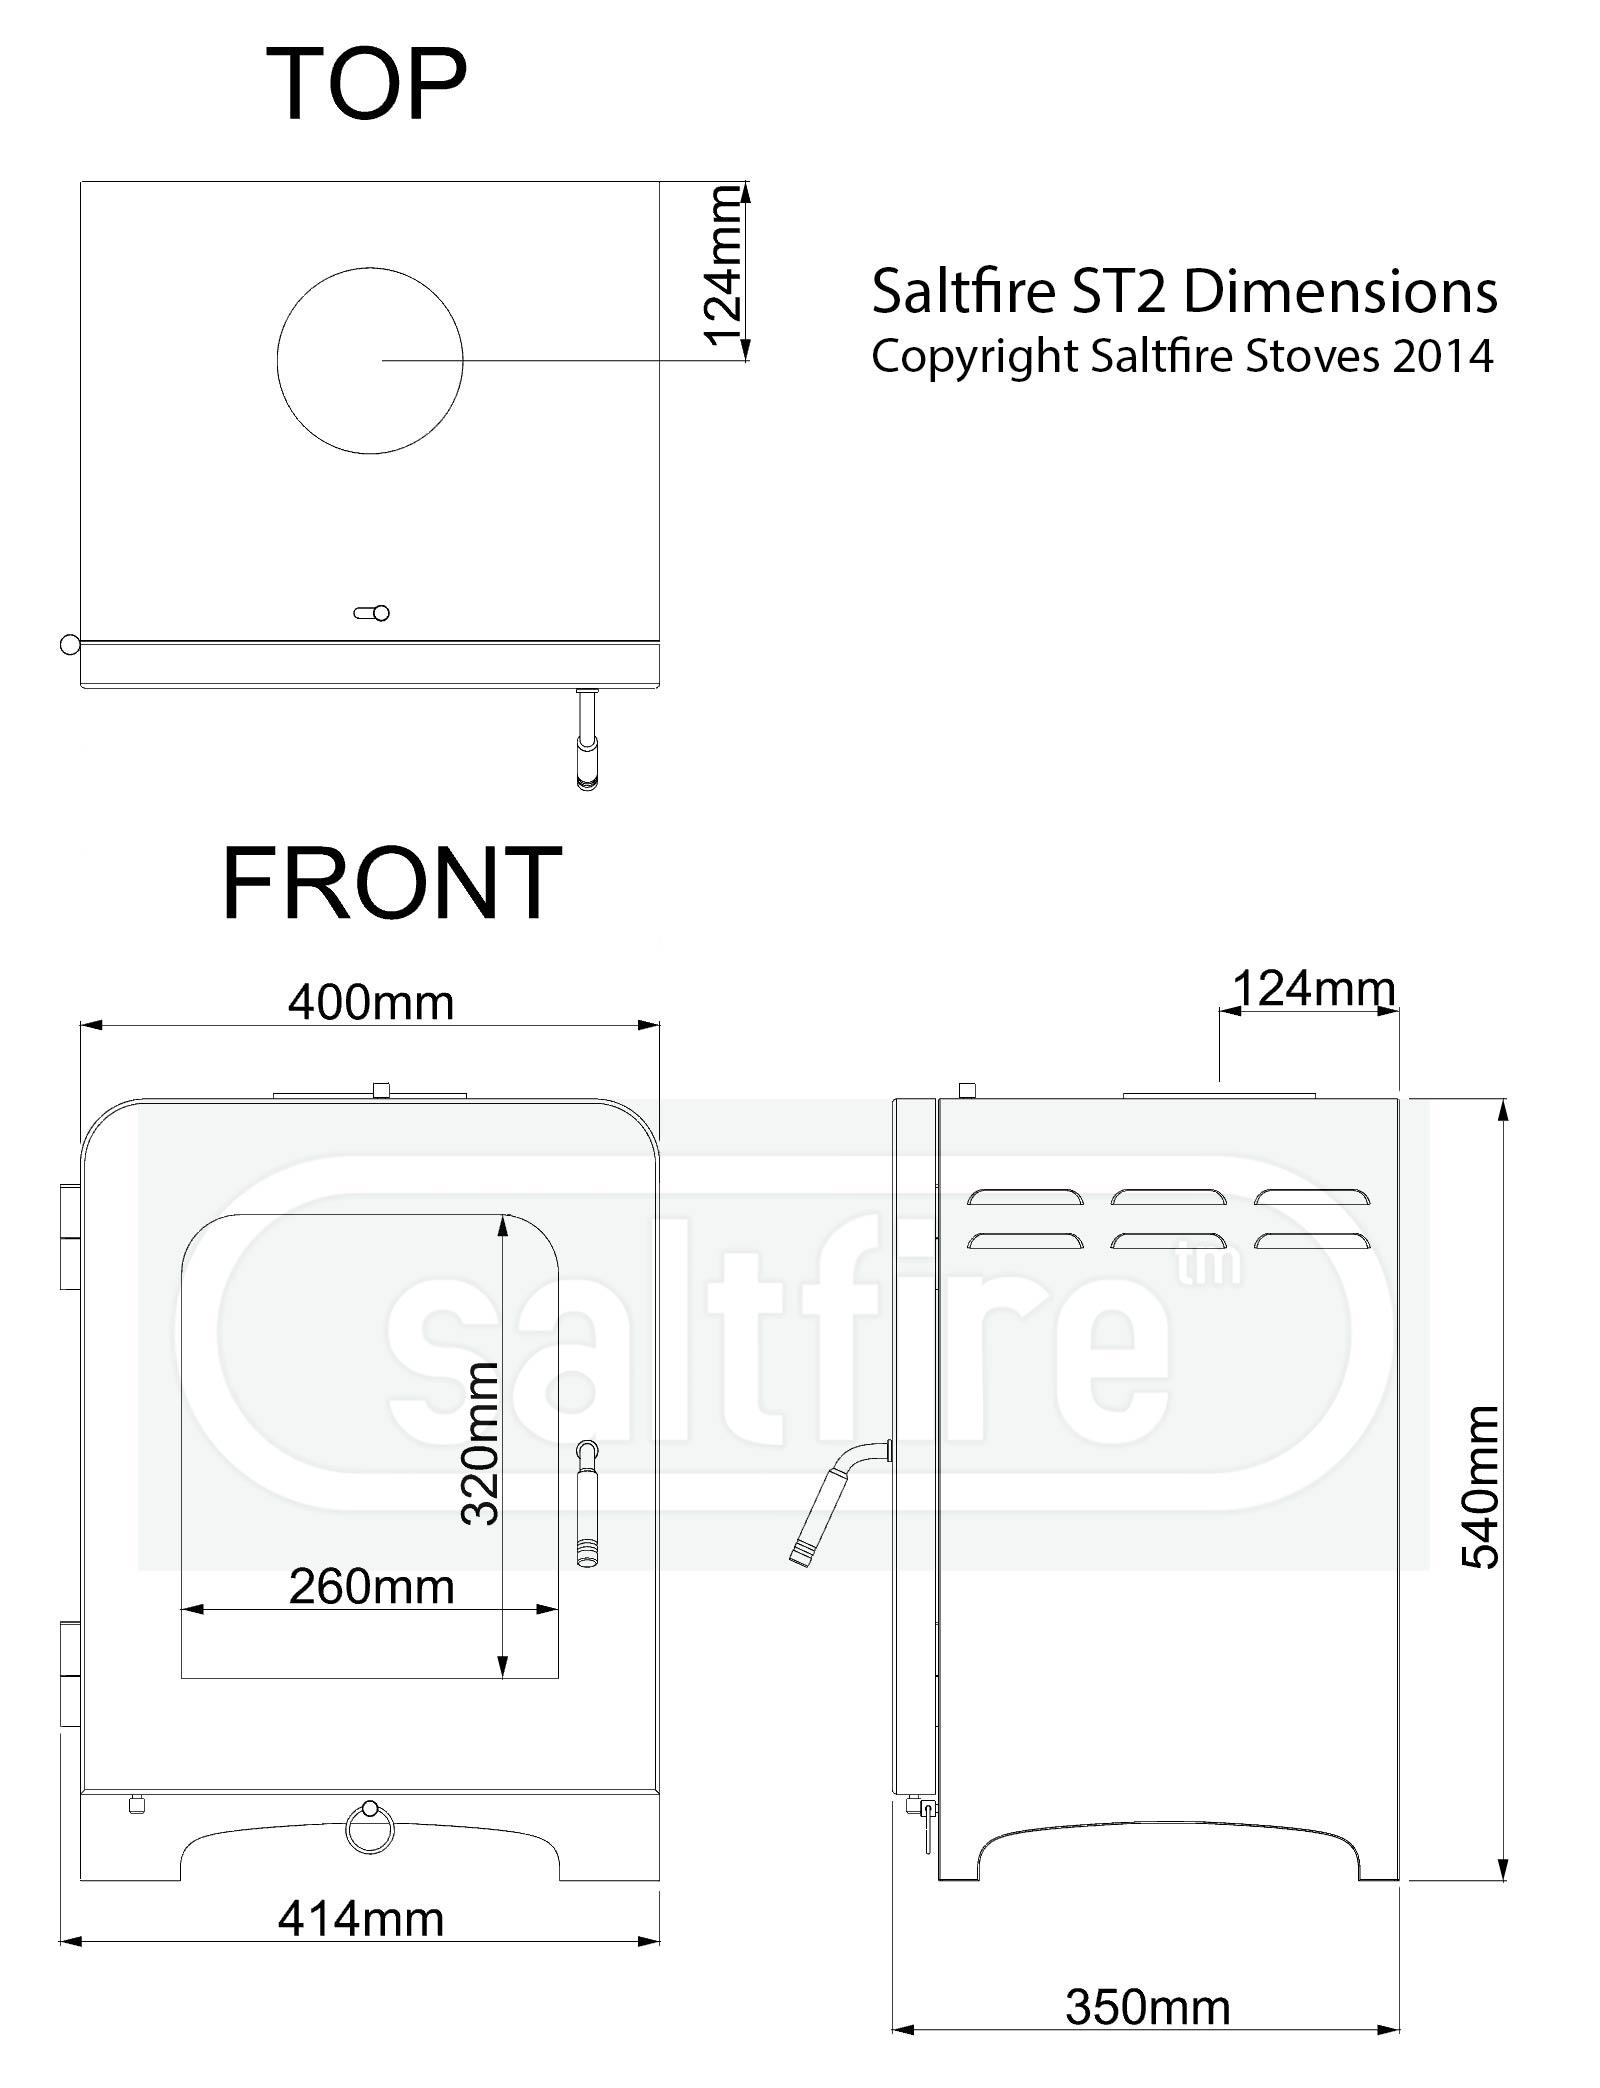 saltfire-st2-stove-dimensions.jpg